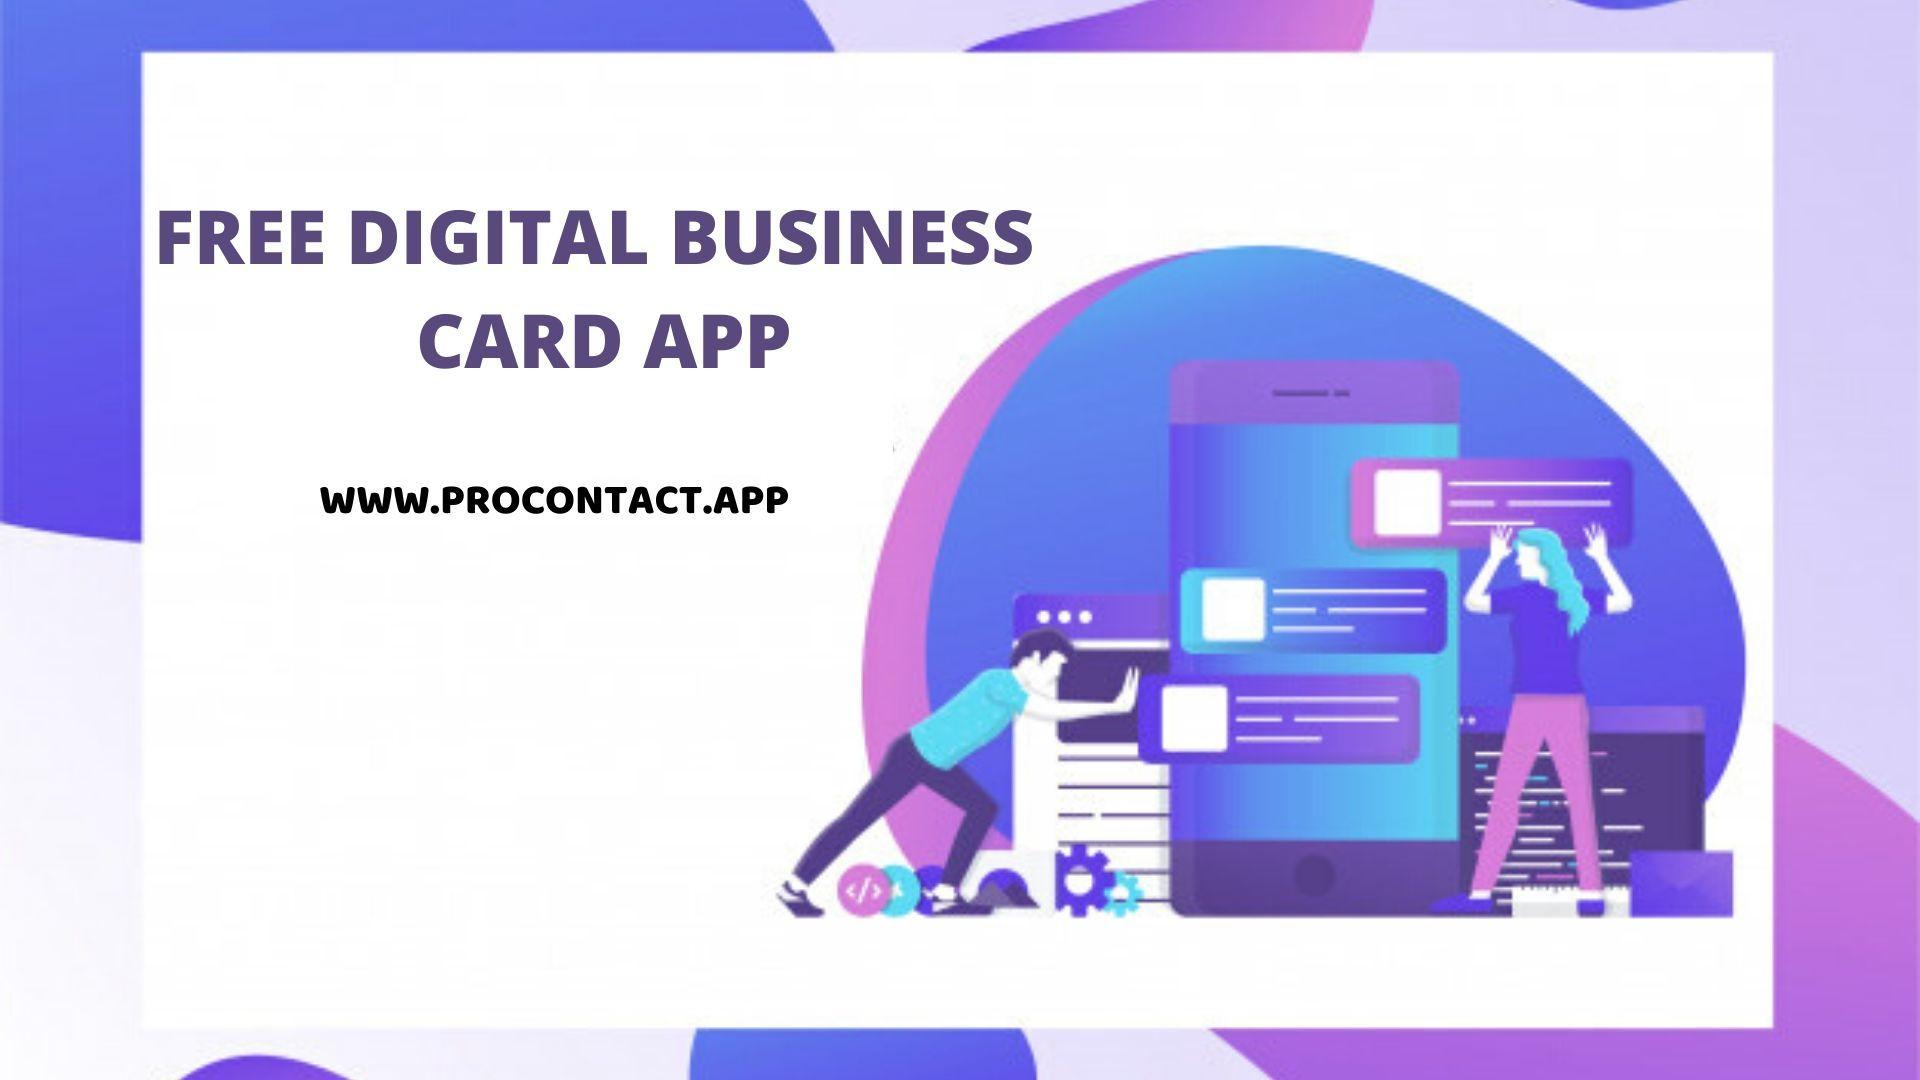 Procontact App Free Digital Business Card App 2020 Business Card App Digital Business Card Digital Business